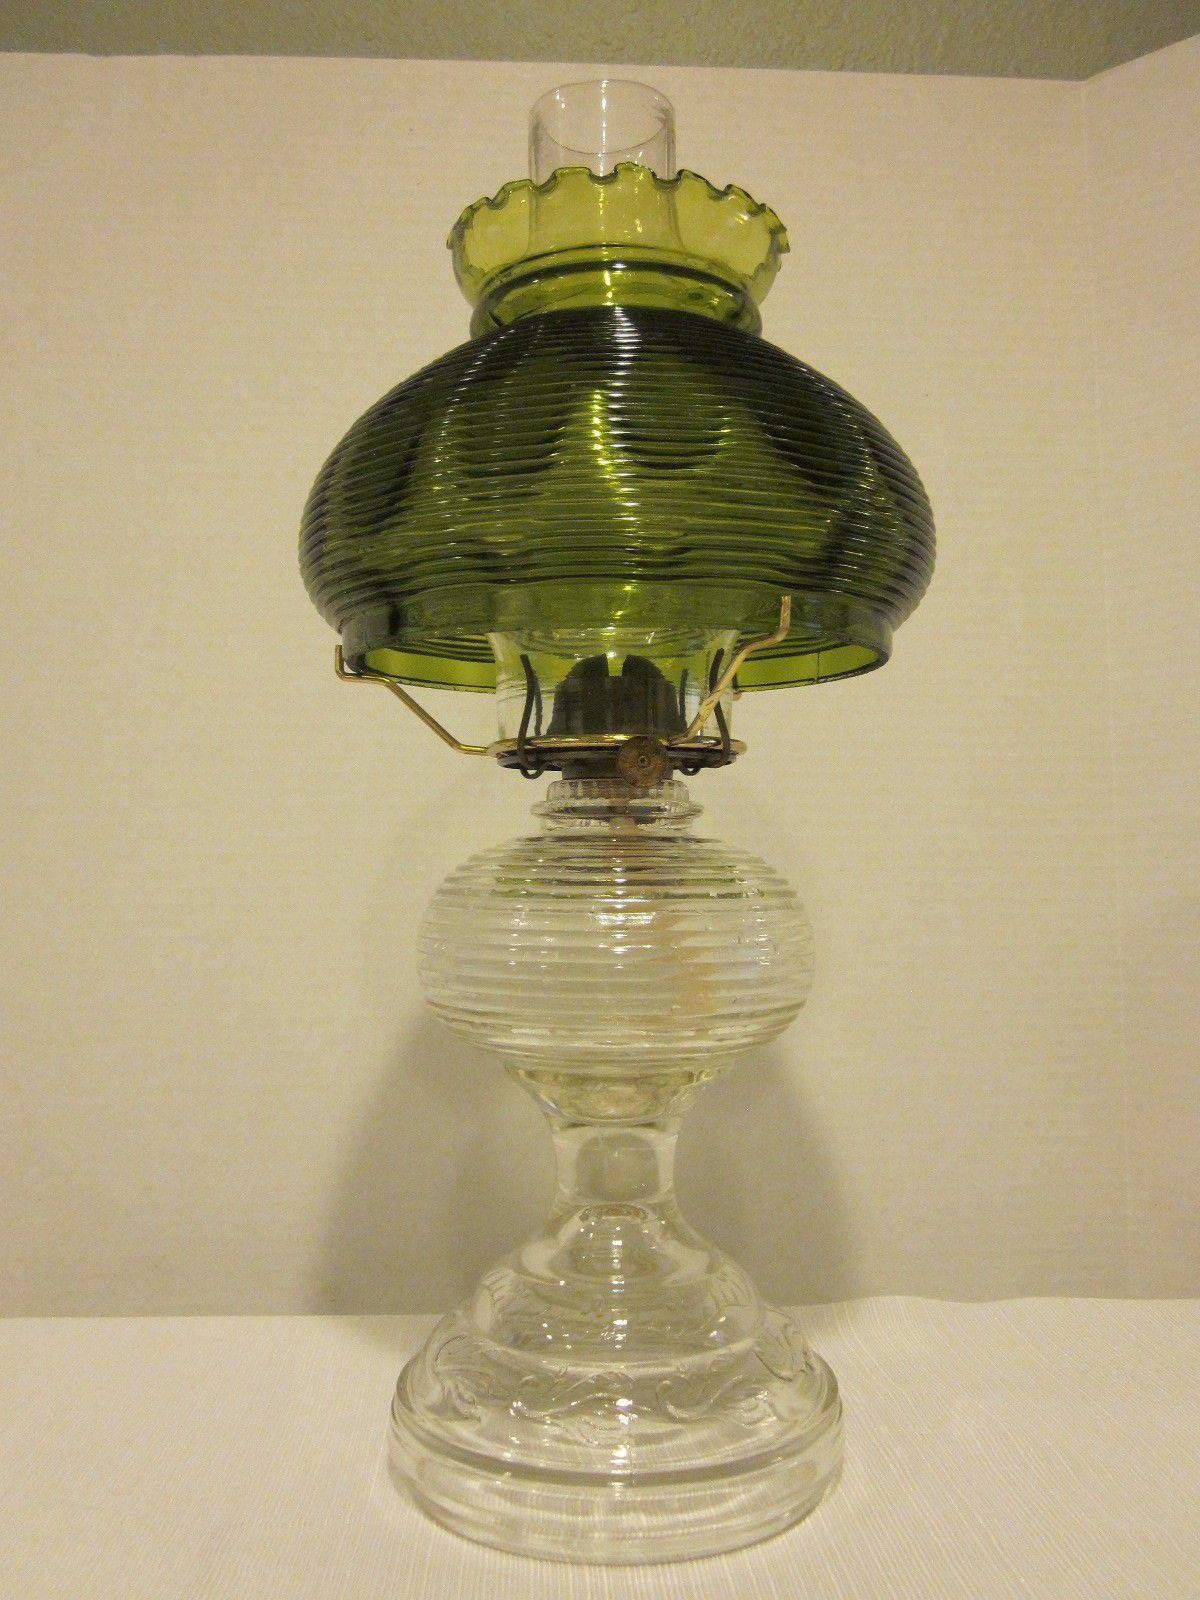 Antique beehive pattern glass oil lamp green art glass shade p a antique beehive pattern glass oil lamp green art glass shade p a eagle burner ebay aloadofball Gallery